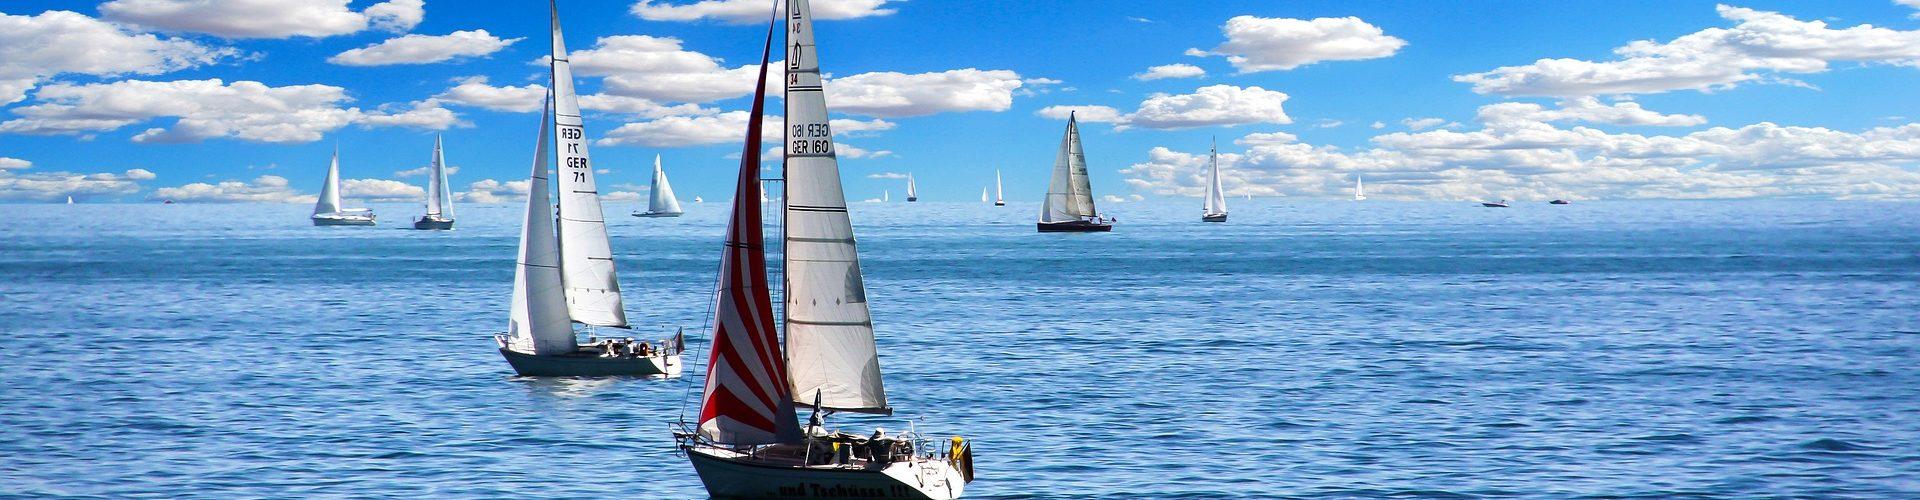 segeln lernen in Oderaue Wustrow Wustrow segelschein machen in Oderaue Wustrow Wustrow 1920x500 - Segeln lernen in Oderaue Wustrow, Wustrow